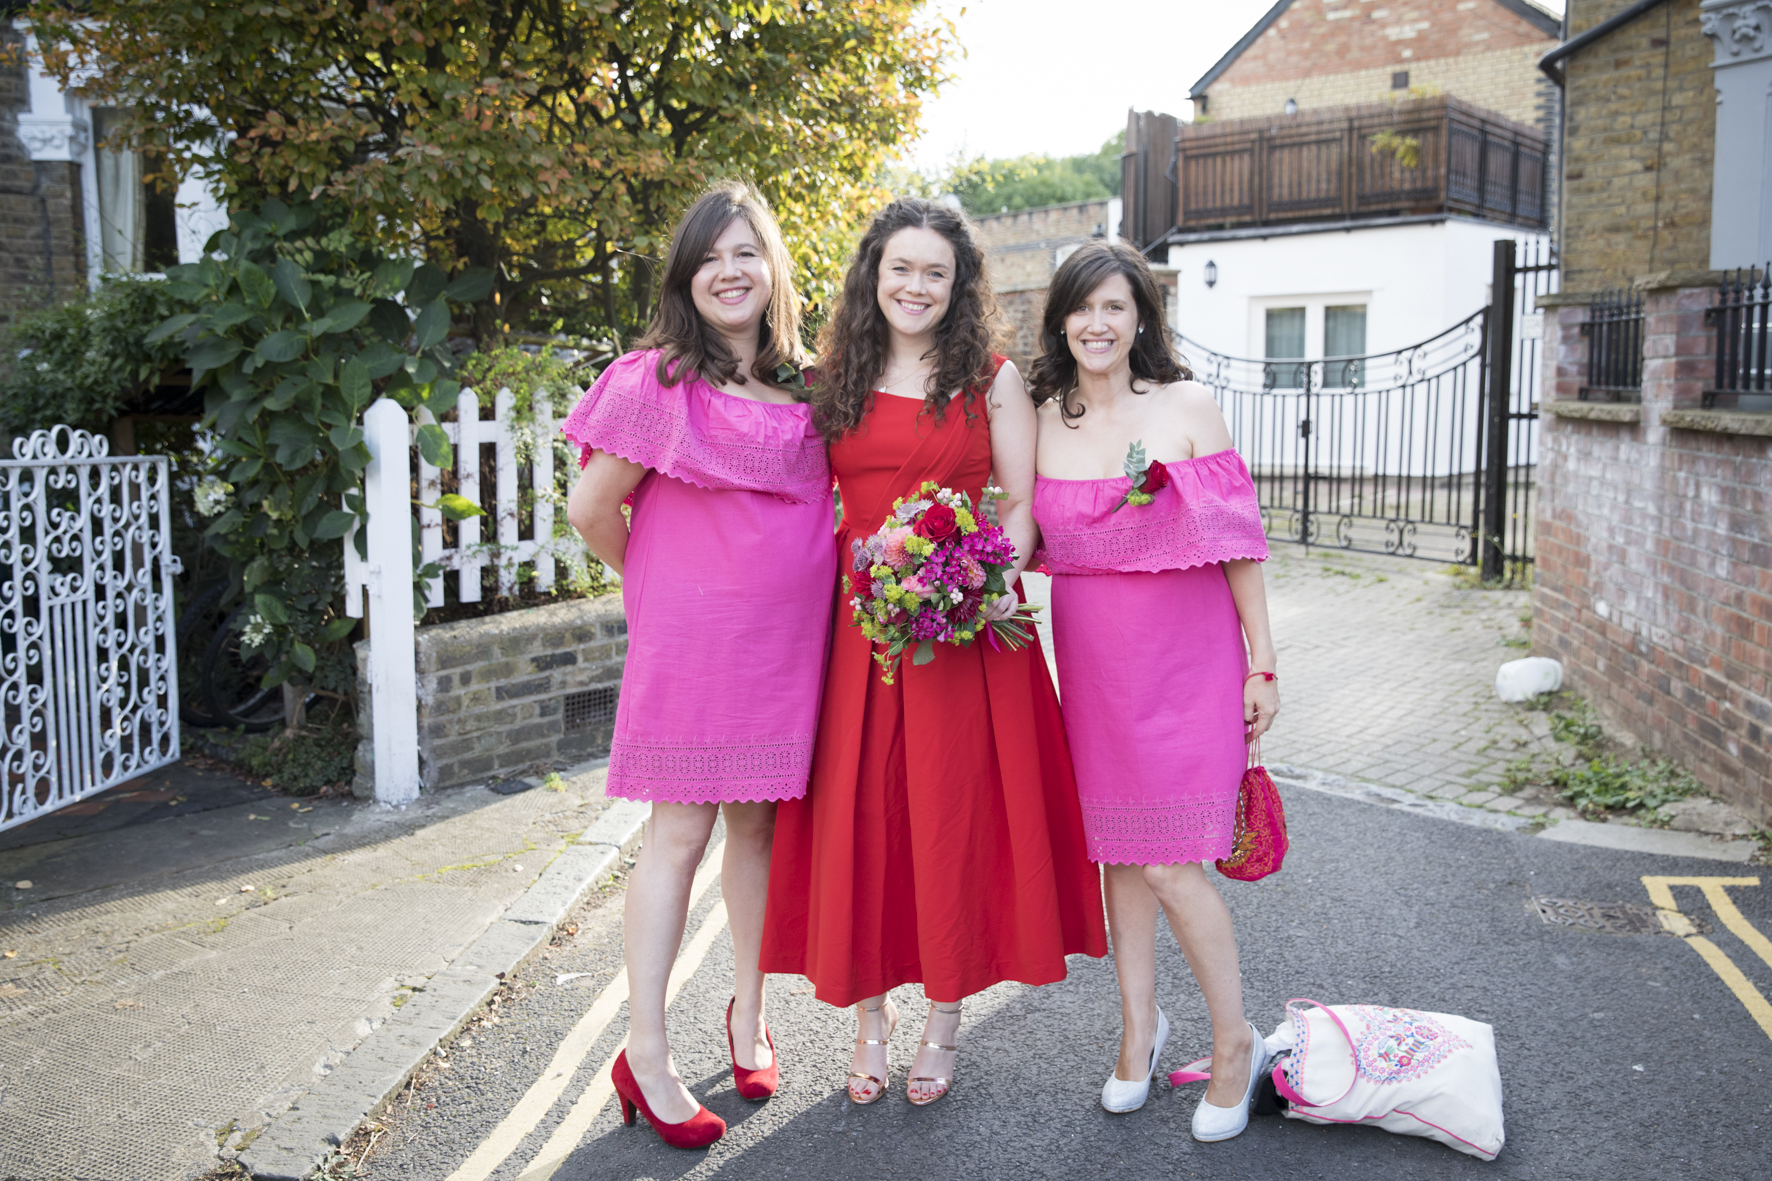 Wedding example_J&J_'16__69A1482_Claudia Leisinger.jpg